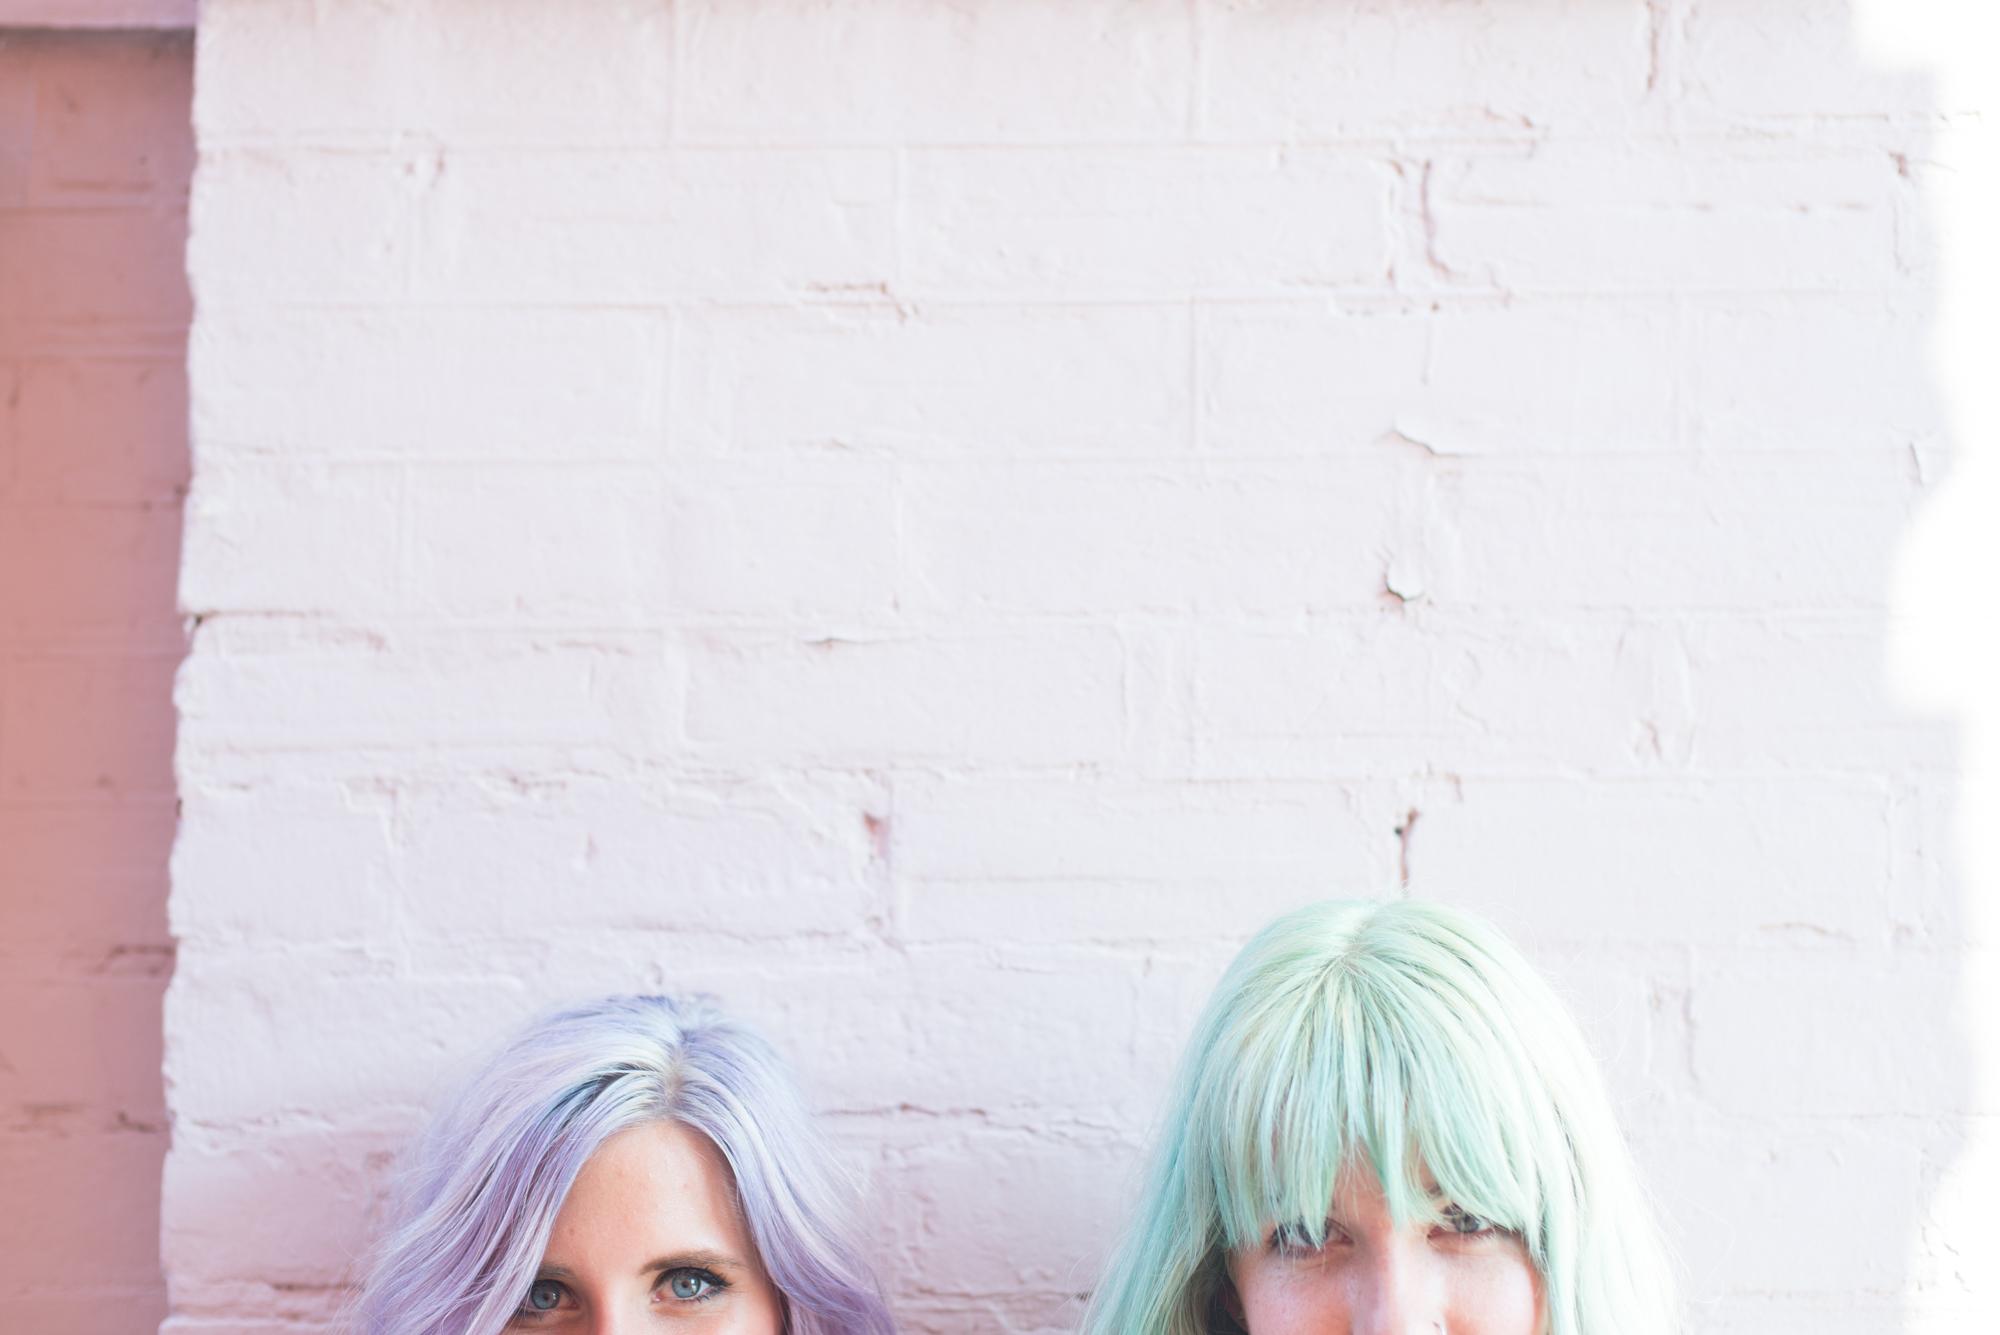 RAOP-twins-602988